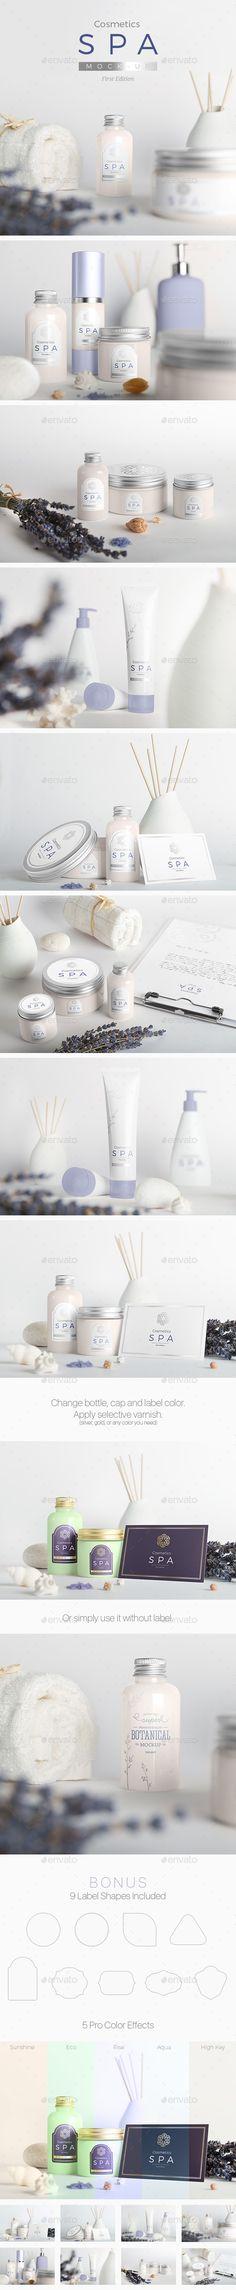 SPA Cosmetics Mock-Up. Download here: http://graphicriver.net/item/spa-cosmetics-mockup-v1/14697437?ref=ksioks